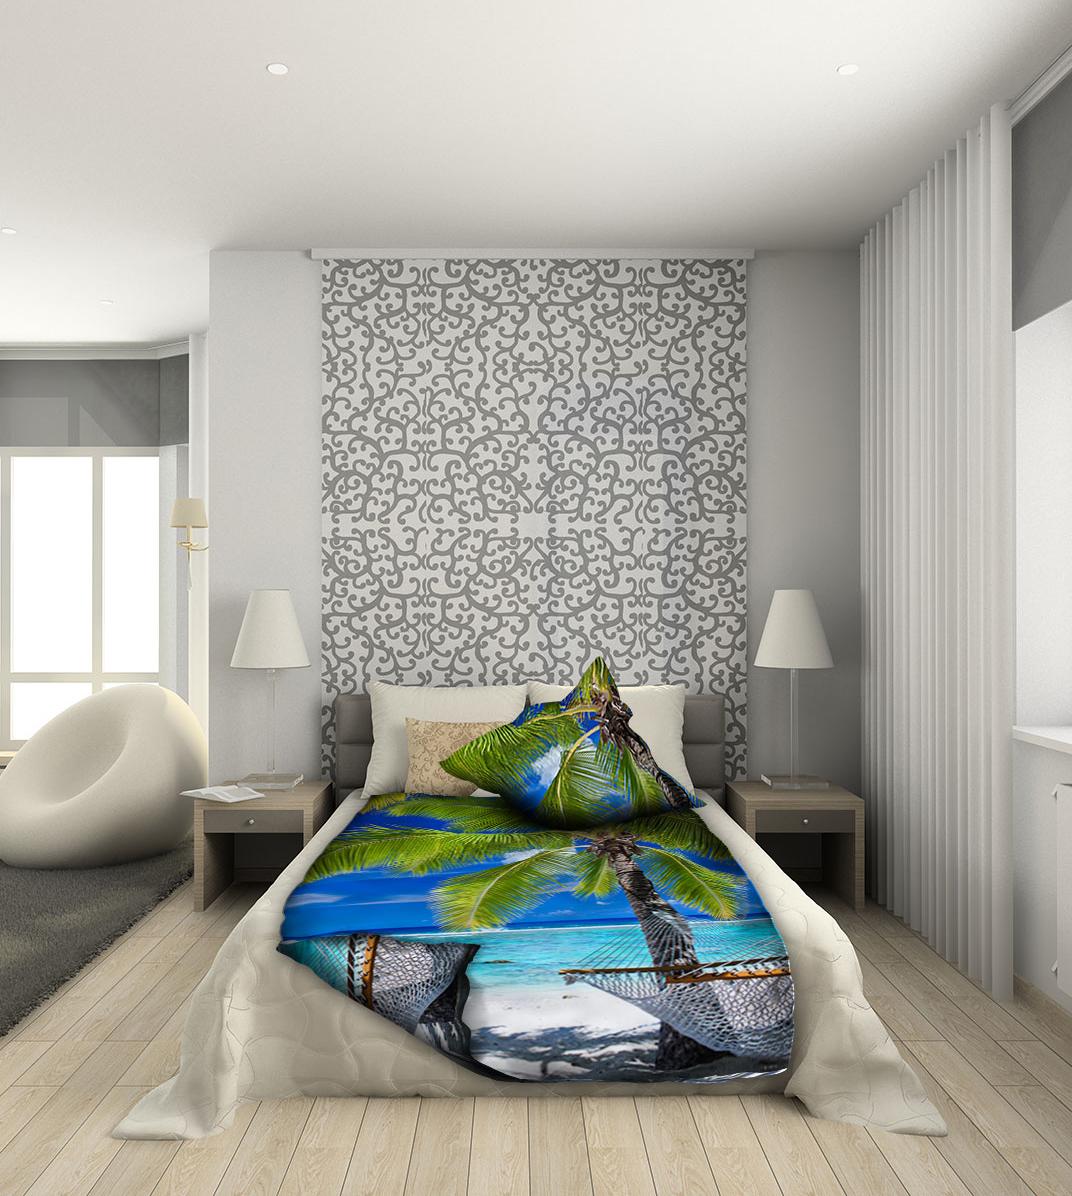 bettw sche mit eigenem foto bedrucken hofer fotos. Black Bedroom Furniture Sets. Home Design Ideas